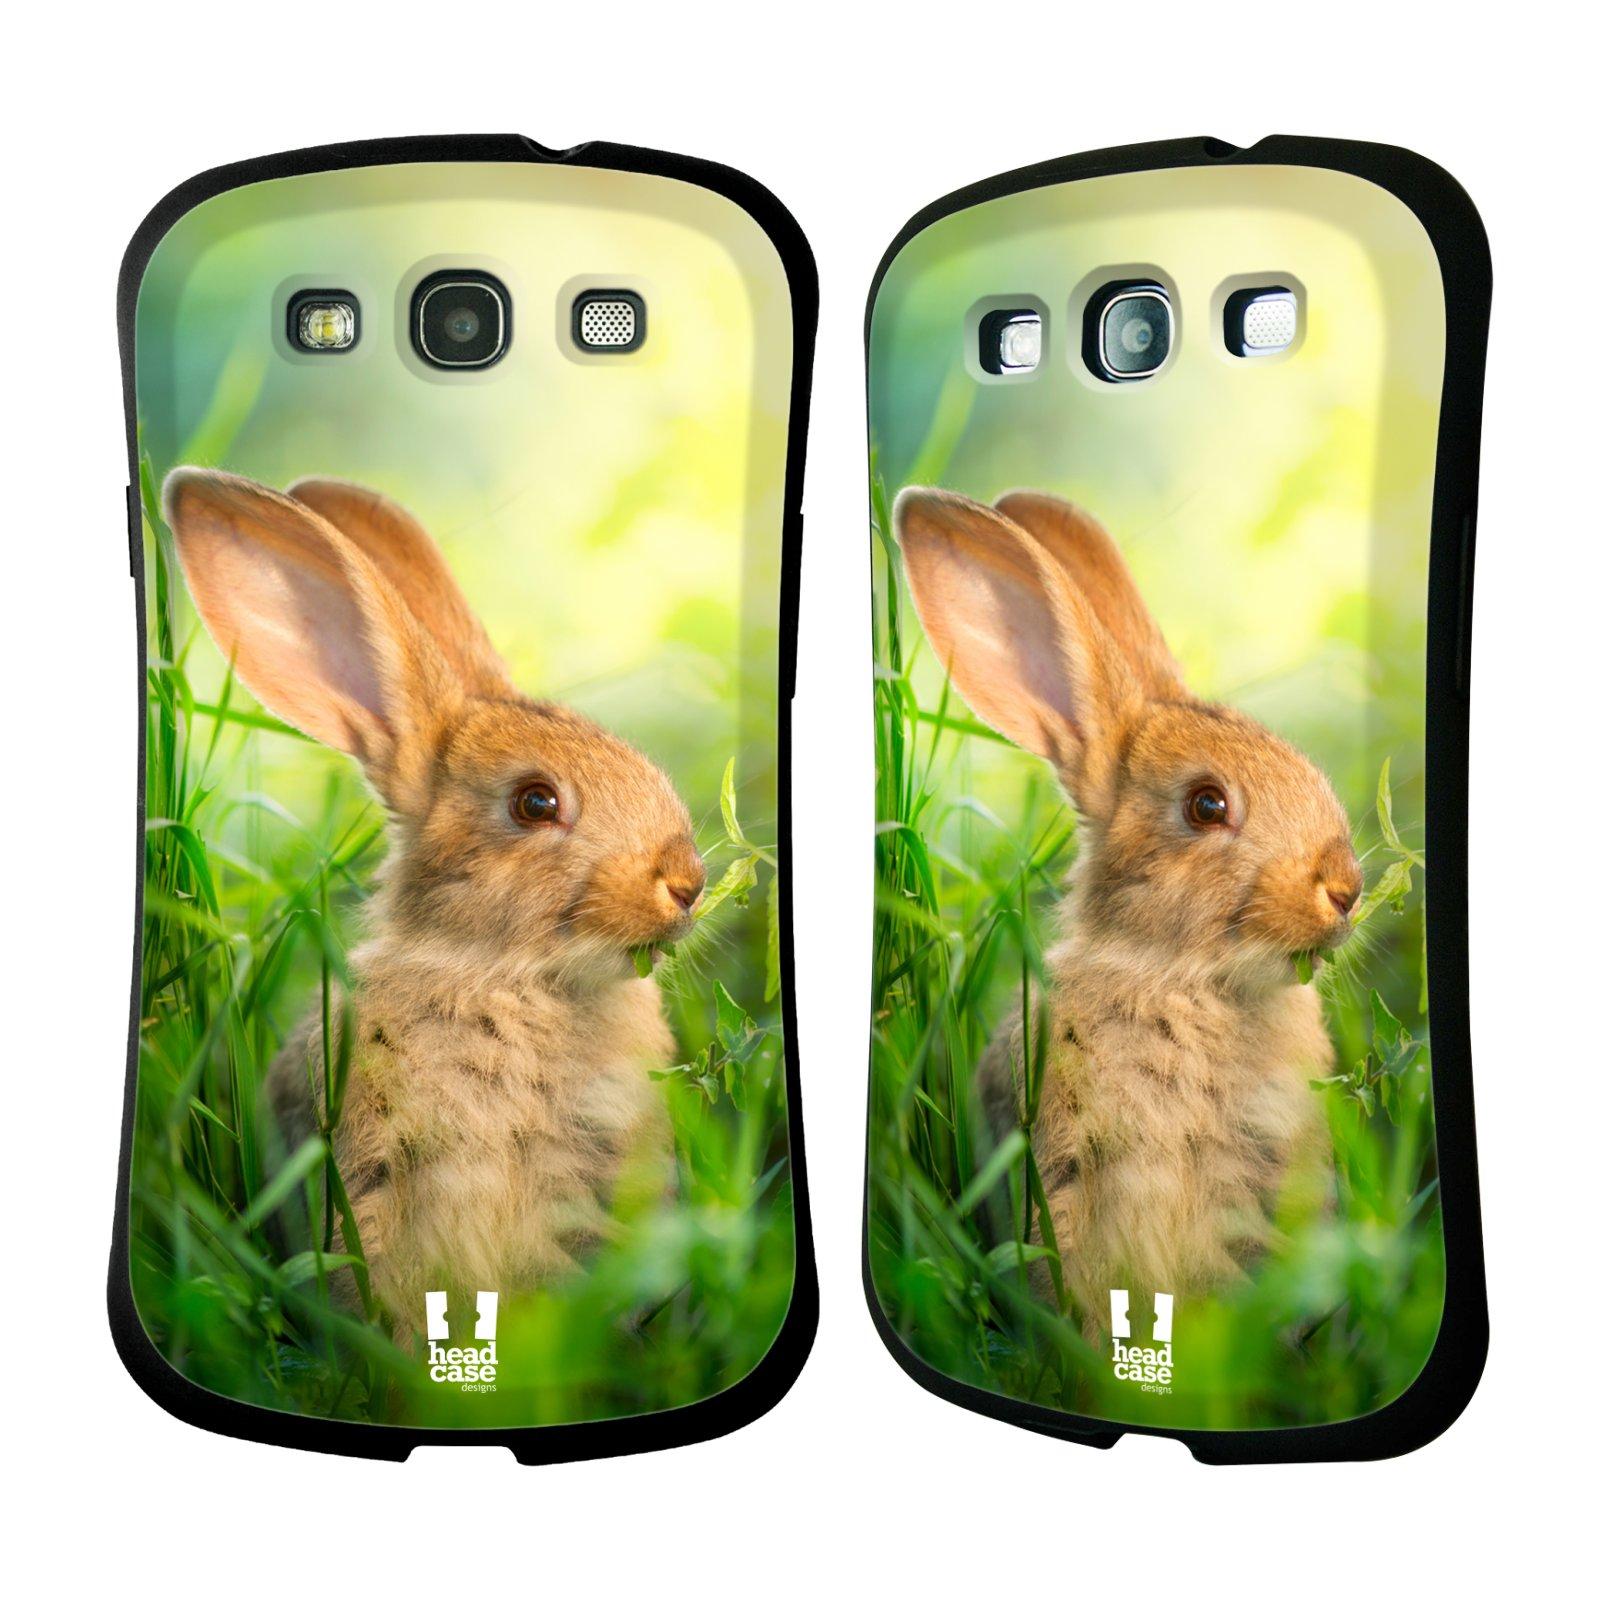 HEAD CASE silikon/plast odolný obal na mobil Samsung Galaxy S3 vzor Divočina, Divoký život a zvířata foto ZAJÍČEK V TRÁVĚ ZELENÁ